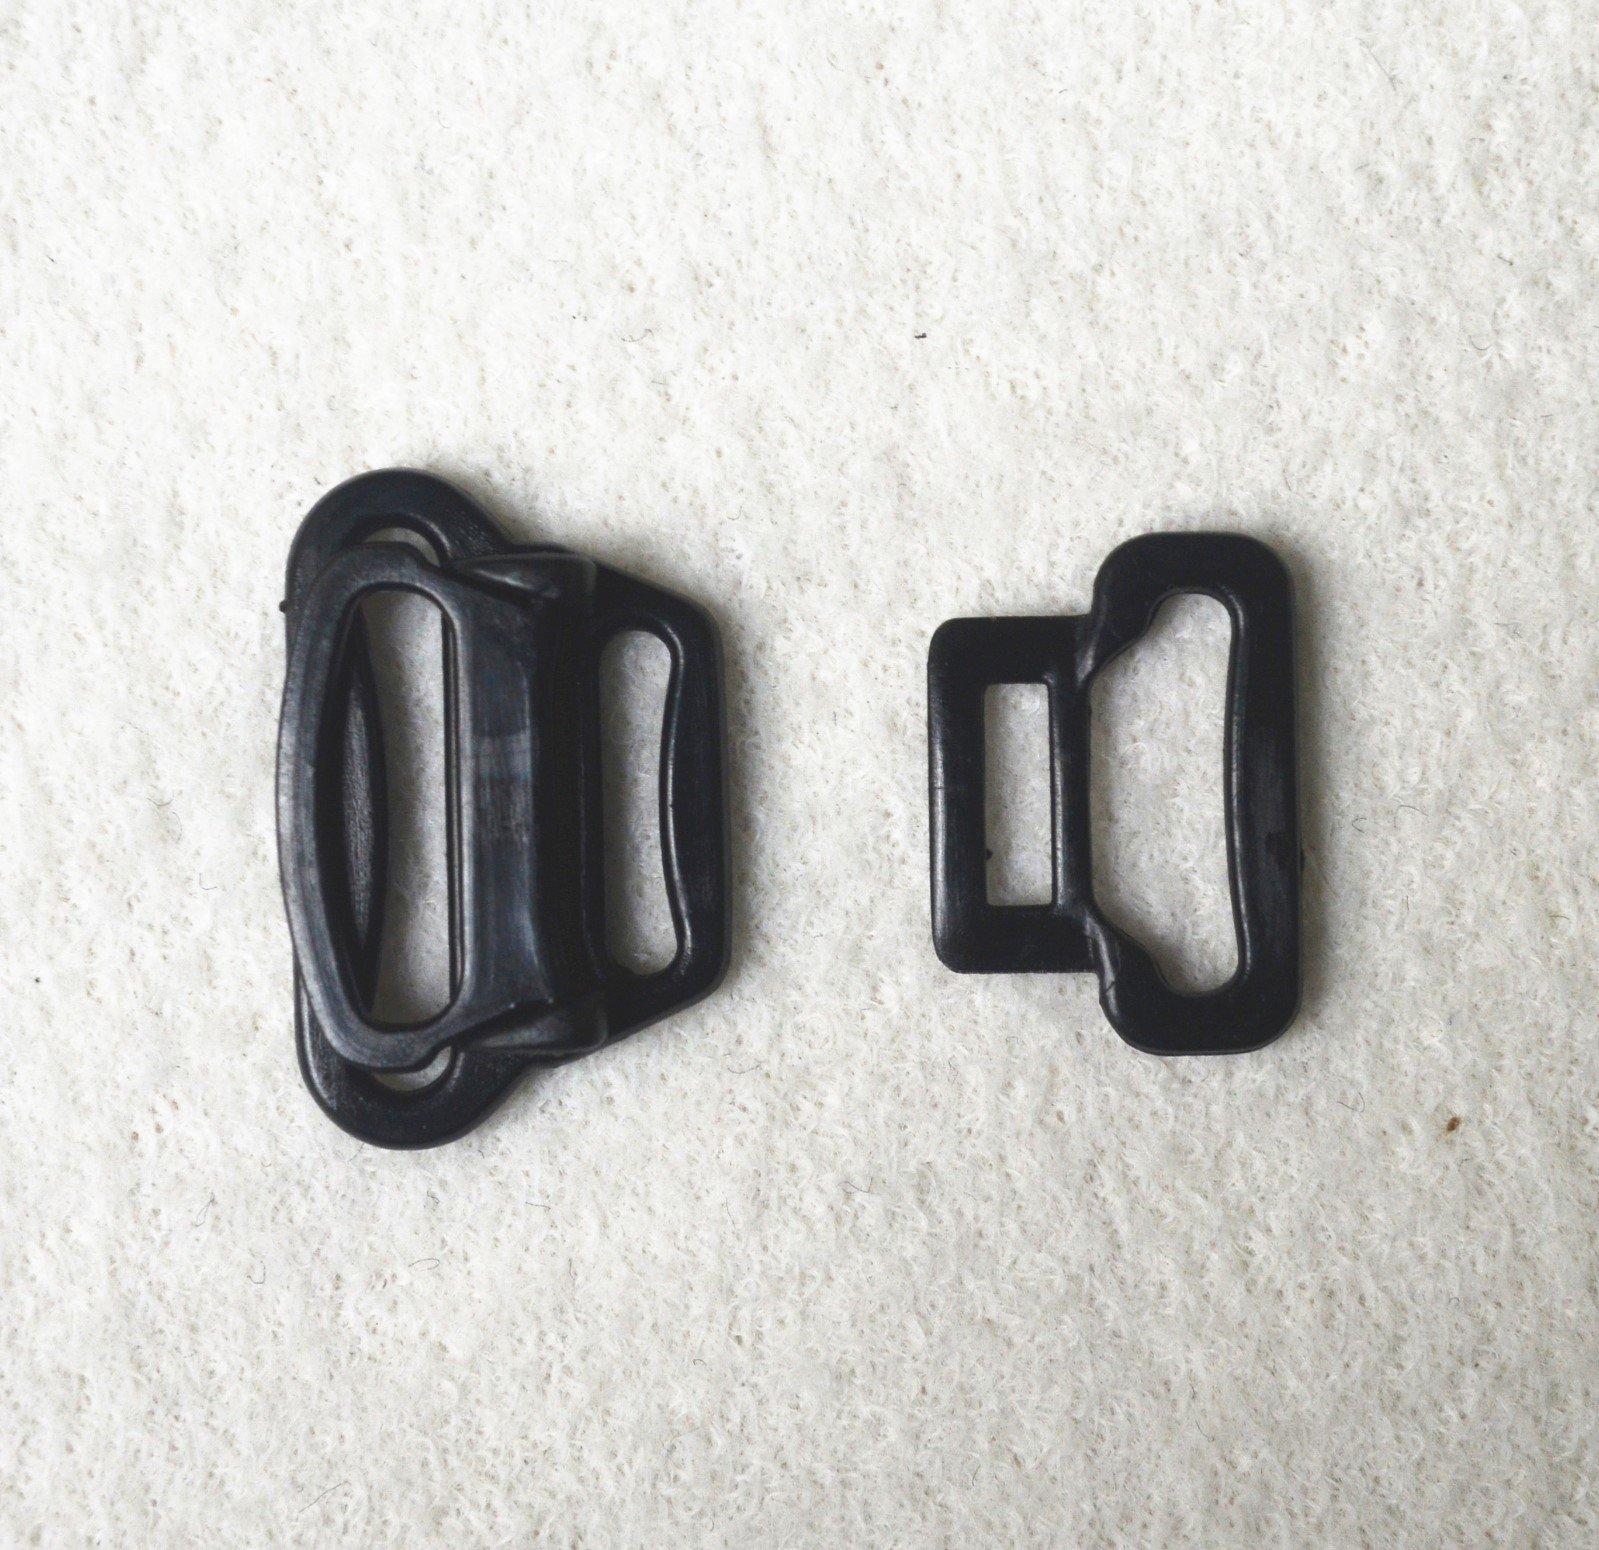 Mayrose-High-quality Bra Straps   Plastic Closure L20m2-1